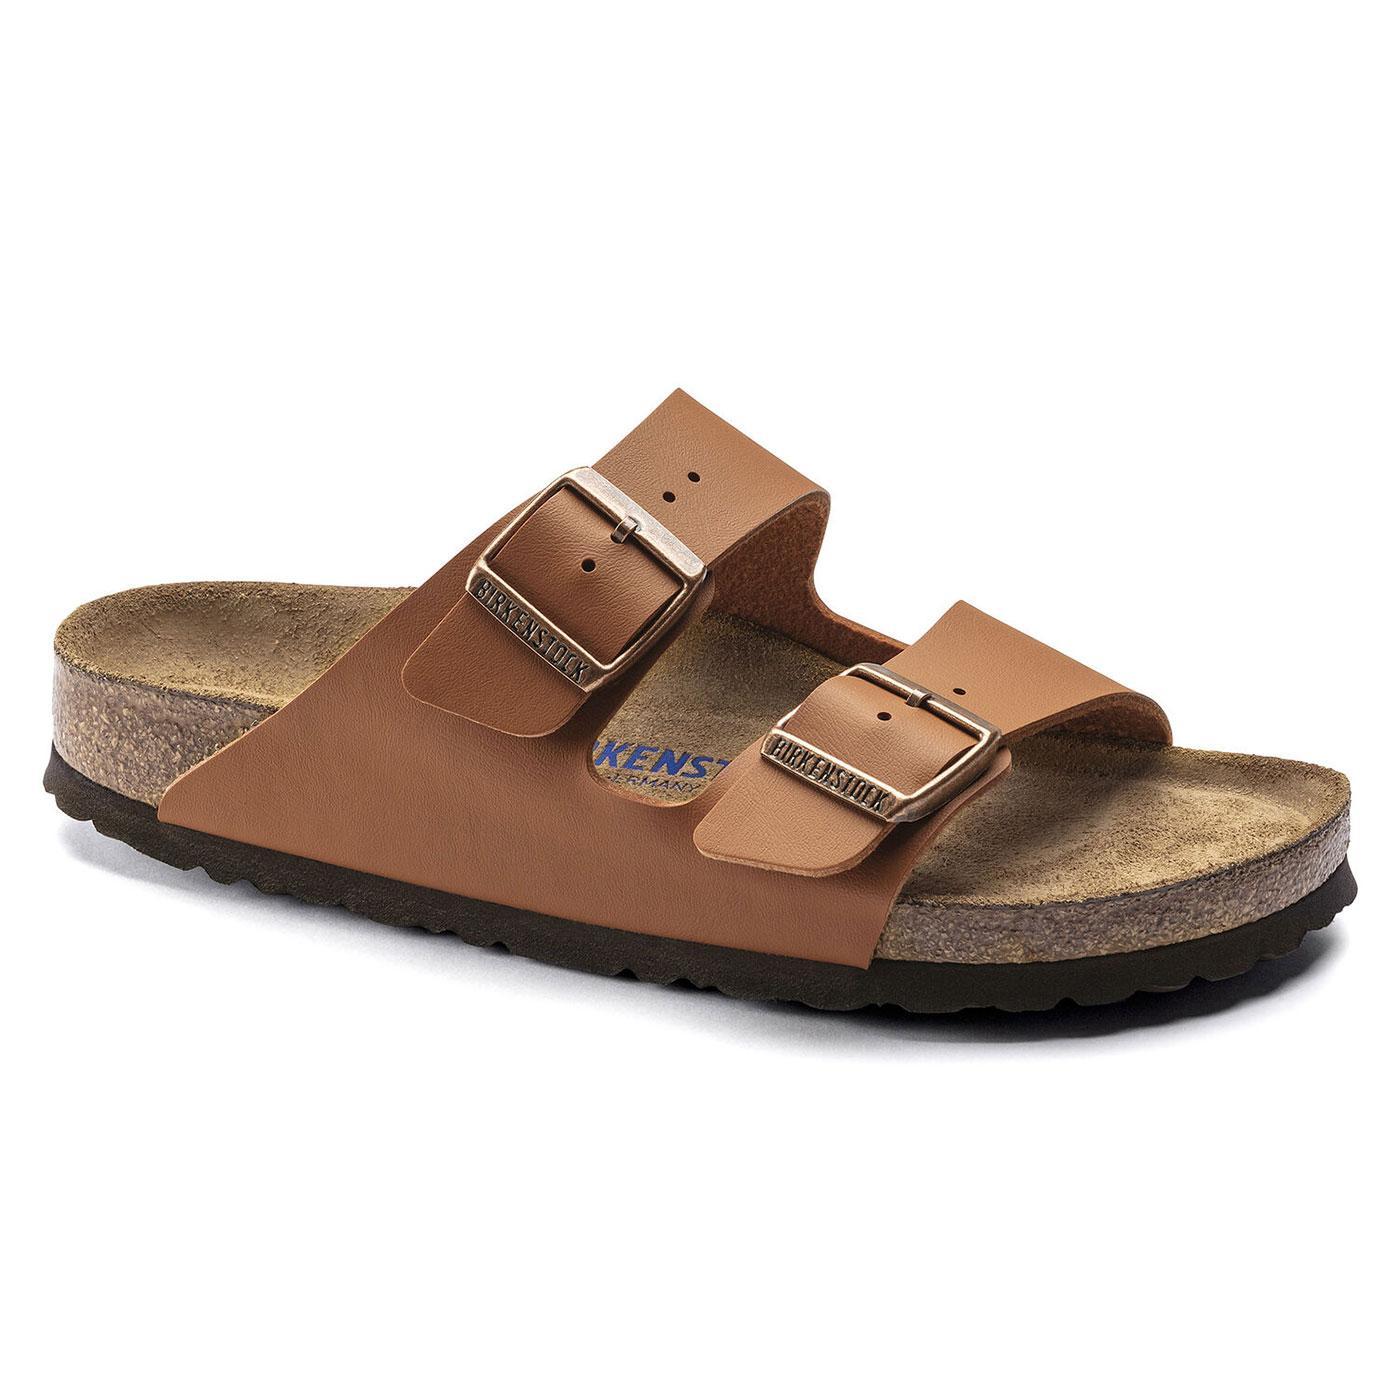 Arizona BF BIRKENSTOCK Soft Footbed Sandals GB